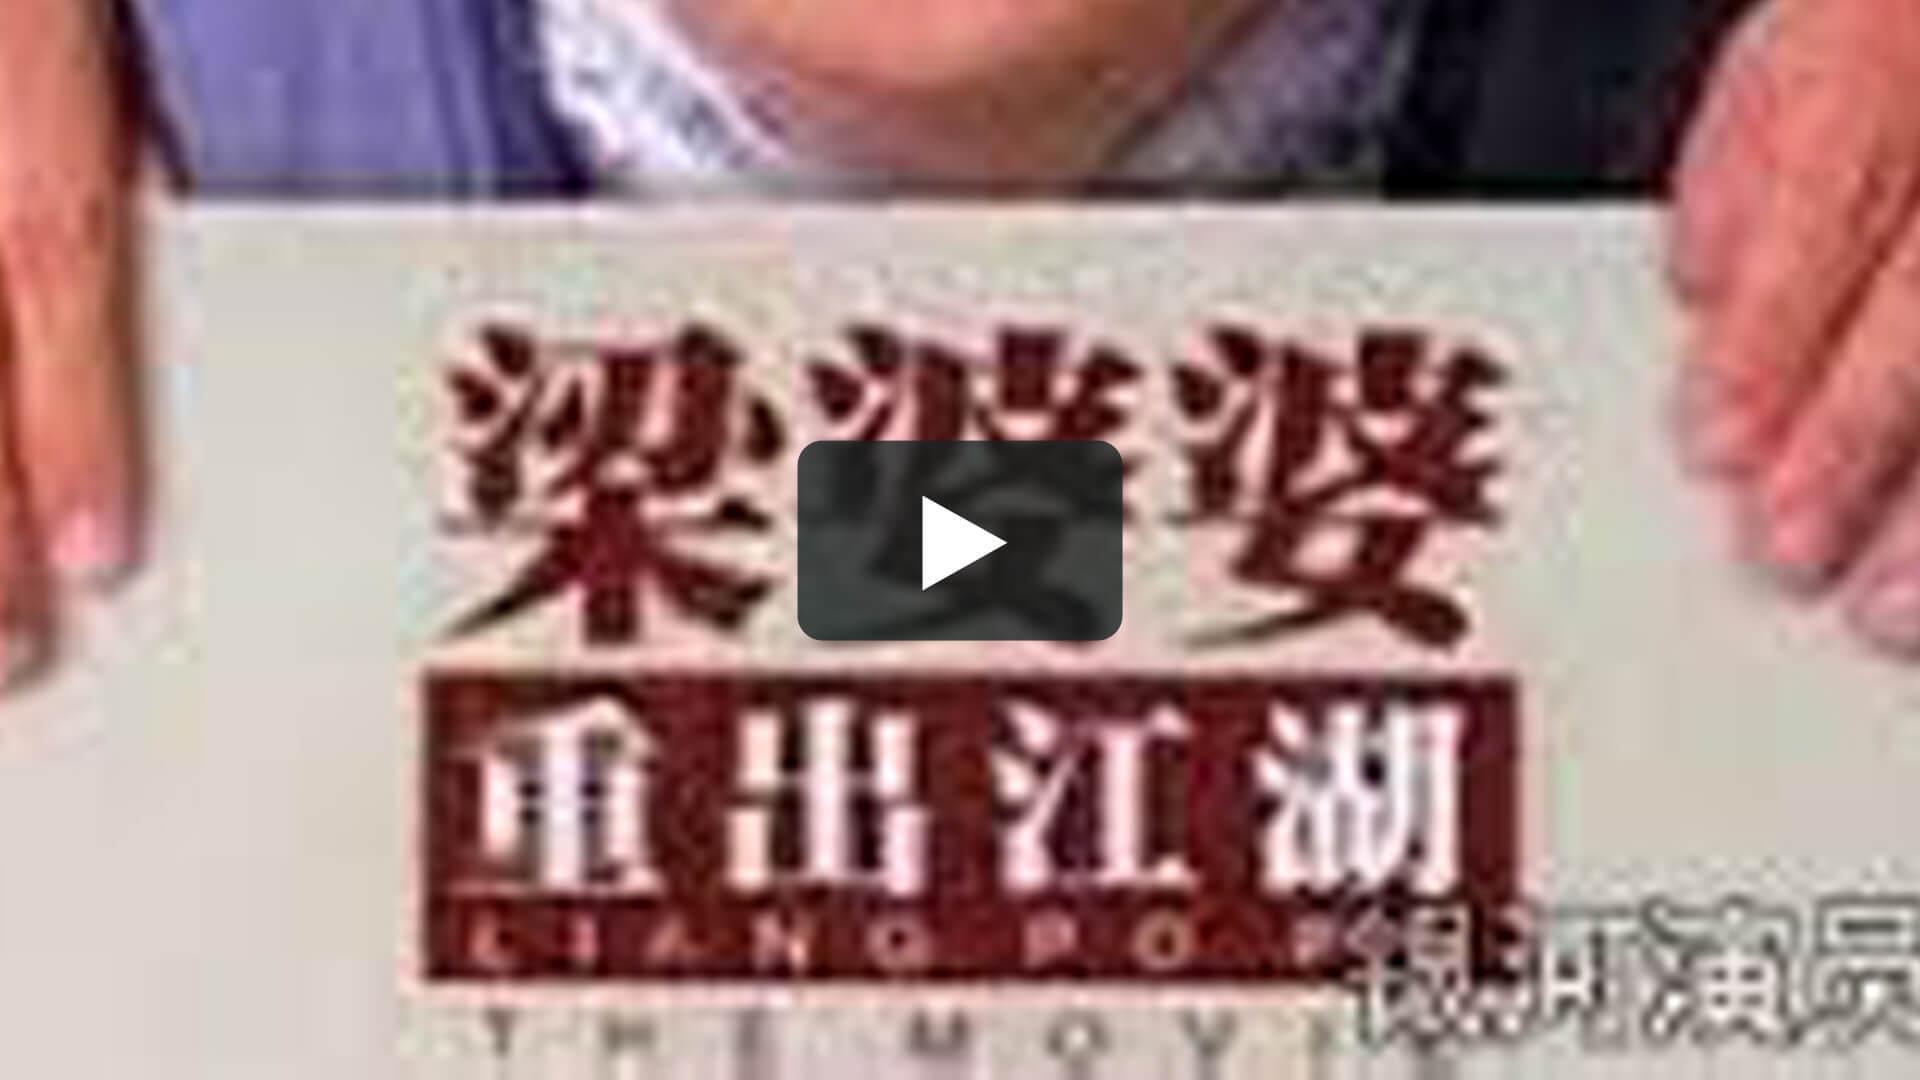 梁婆婆重出江湖 - Liang Po Po: The Movie